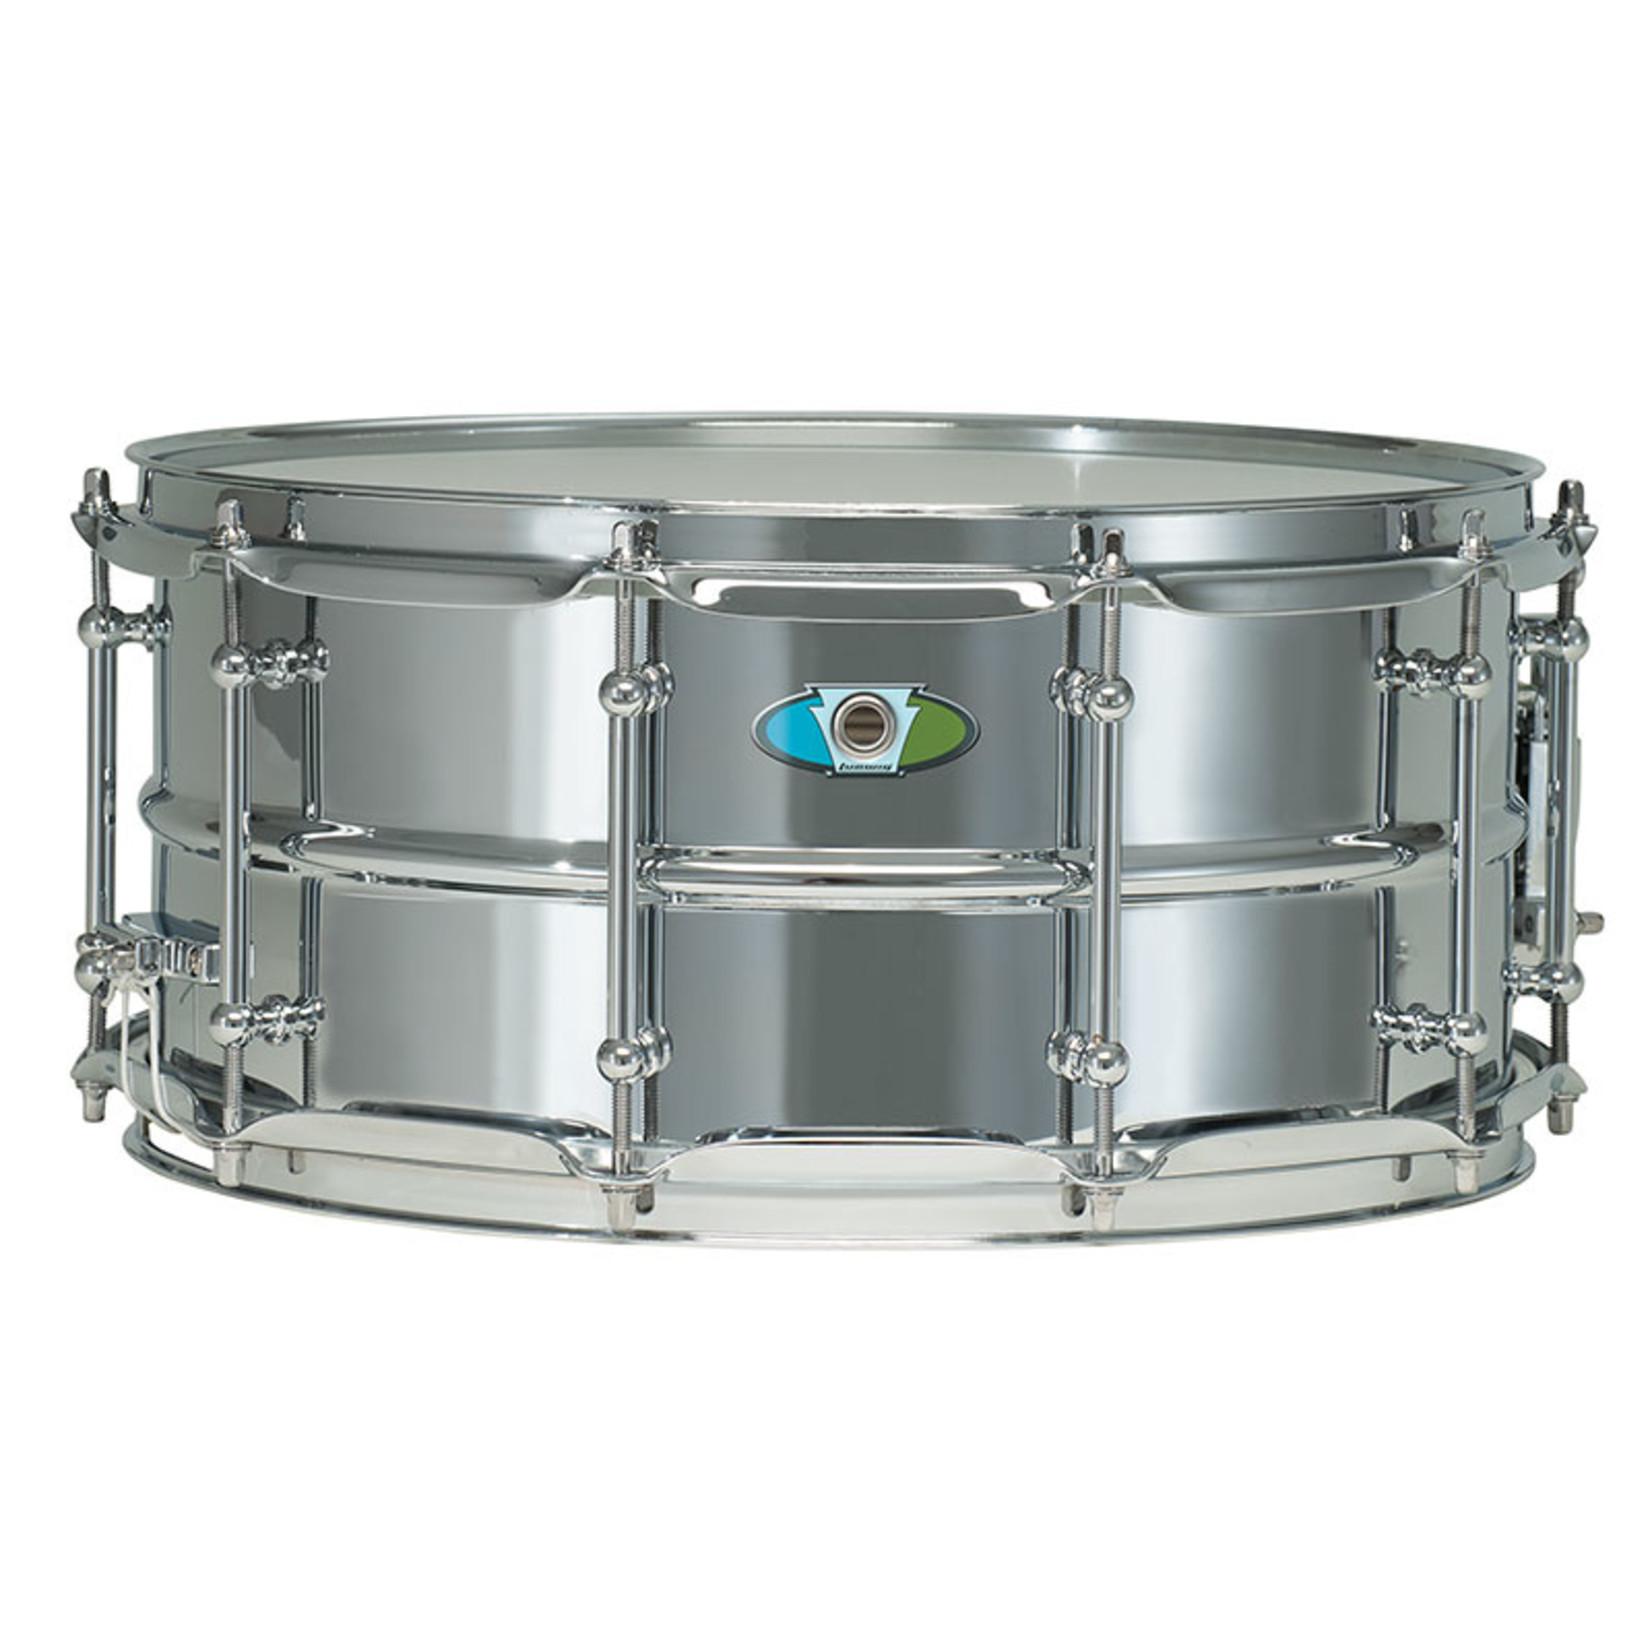 Ludwig Ludwig 6.5X14 Supralite Snare Drum